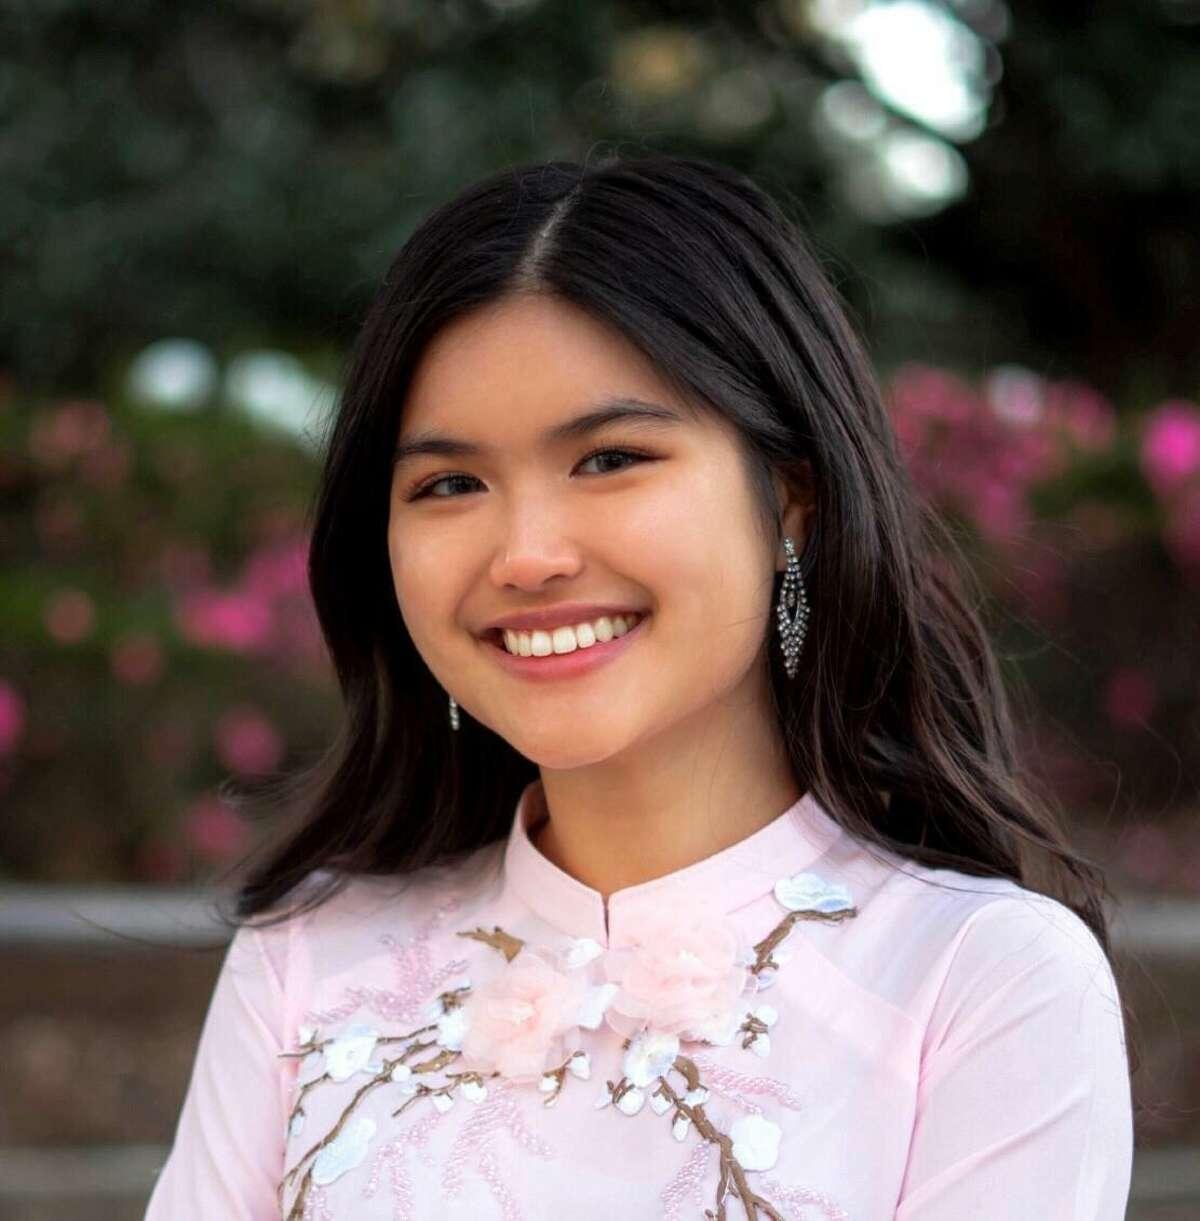 Jennifer Nguyen is the Bush High School valedictorian for the 2020-21 school year.